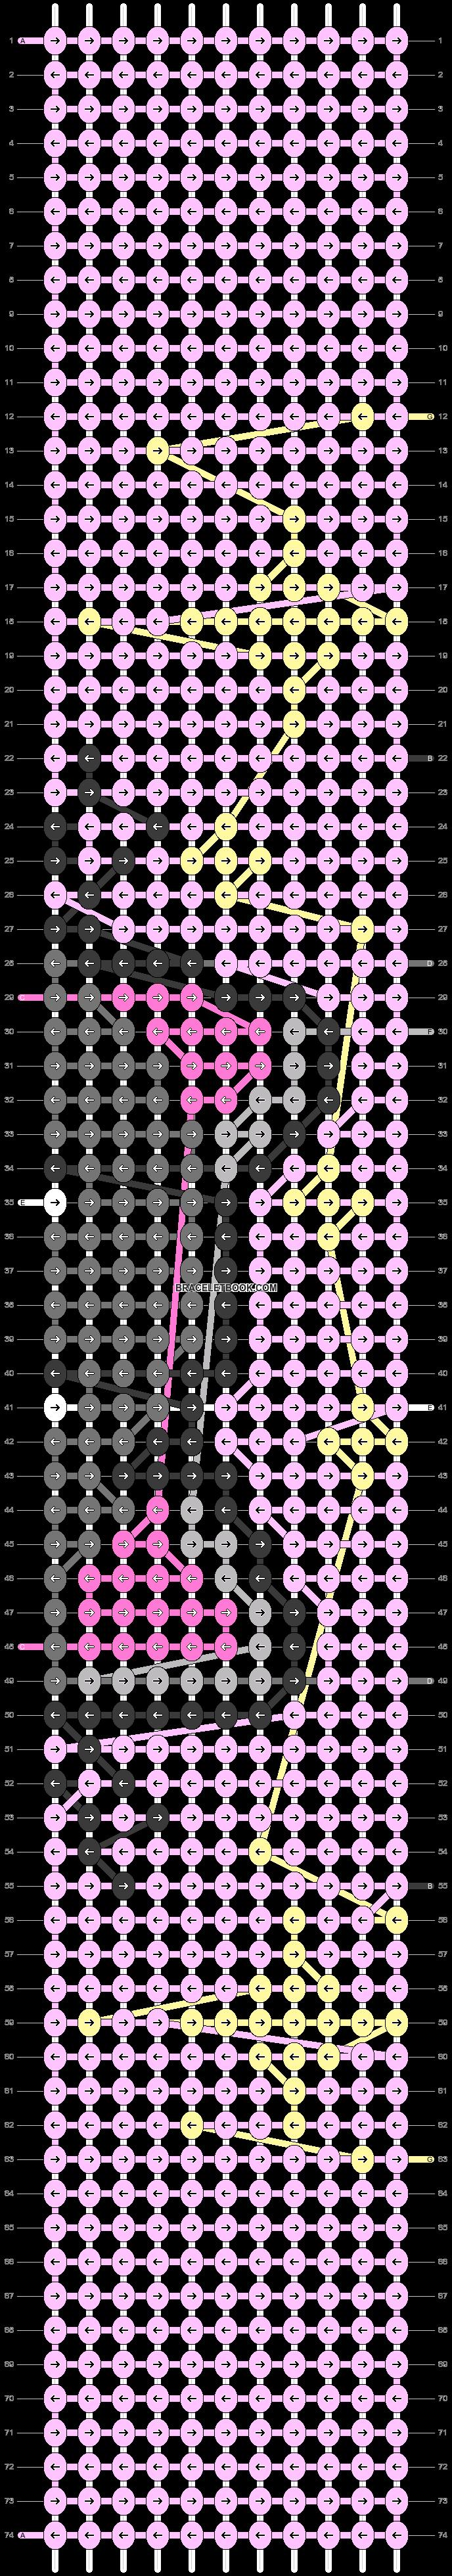 Alpha pattern #46442 pattern